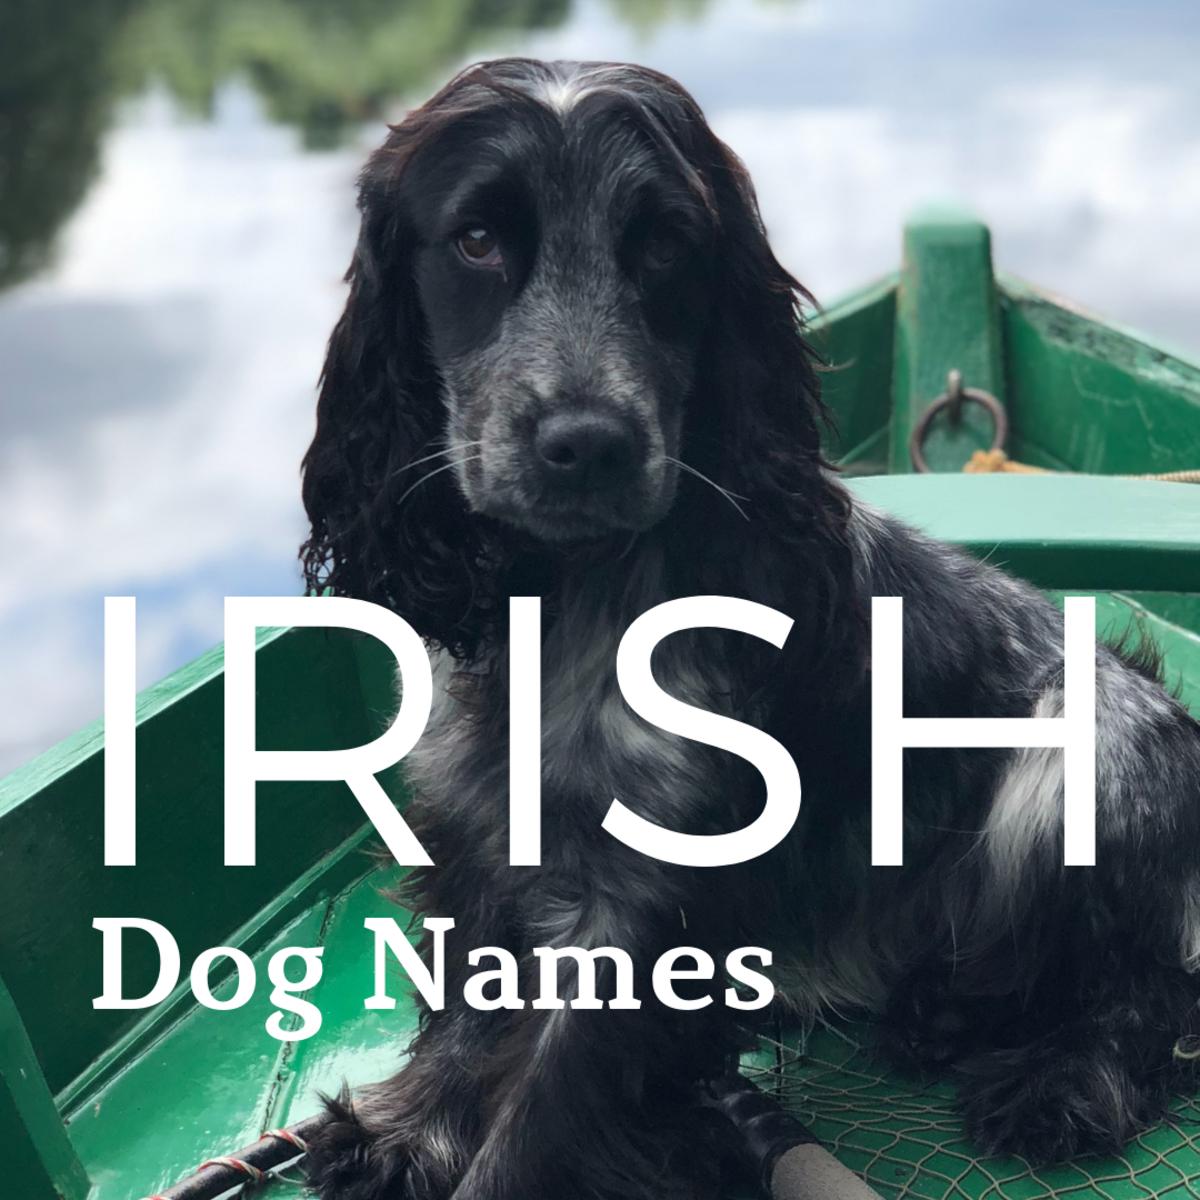 Irish names are magical, mystical, and beautiful.